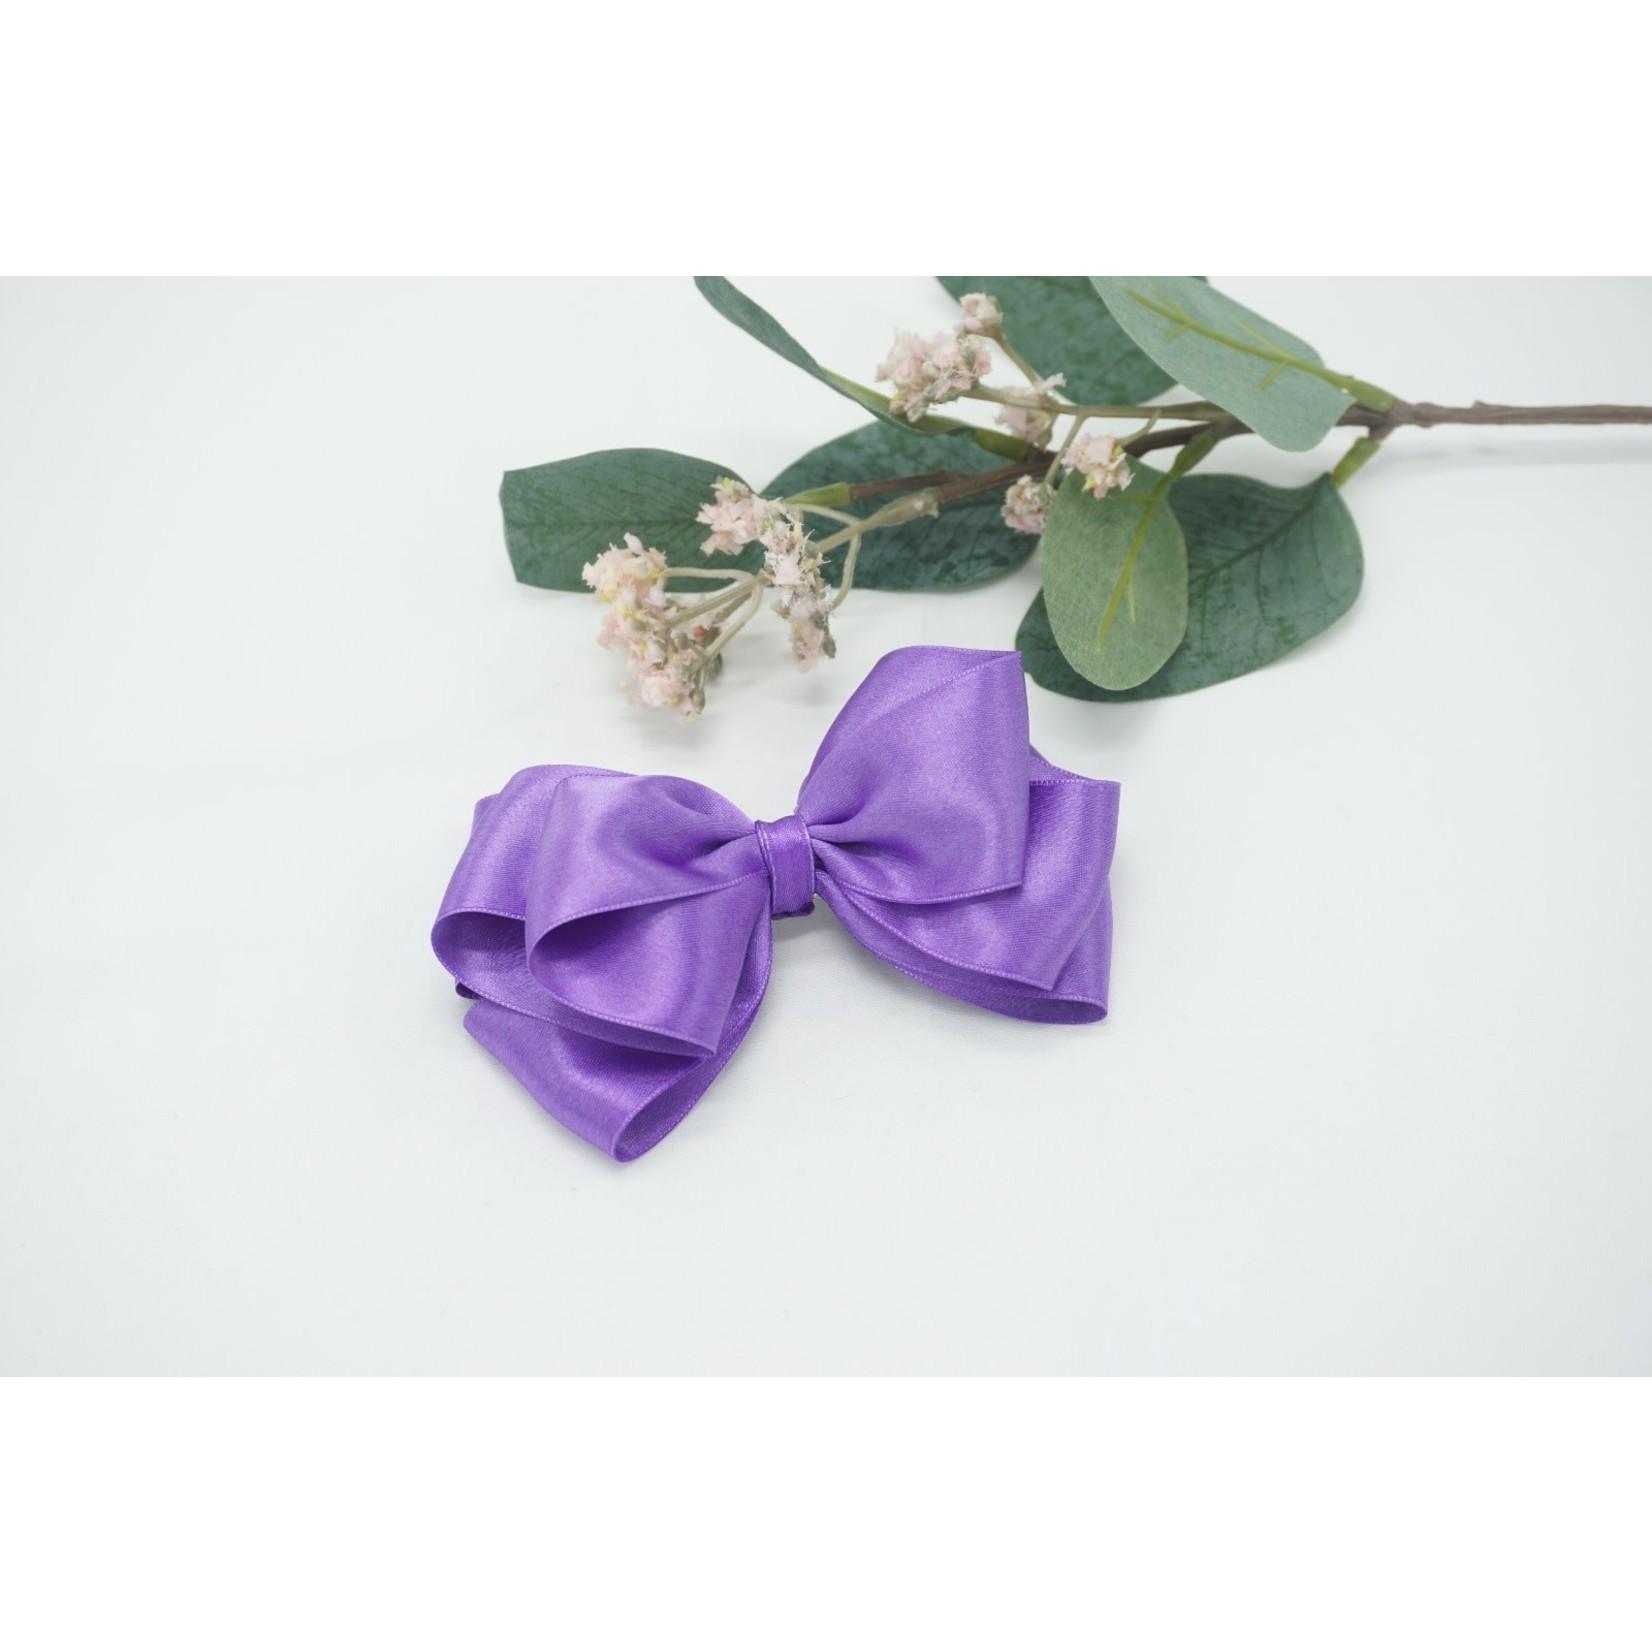 Butterfly Bow - Dark Violet 12 cm